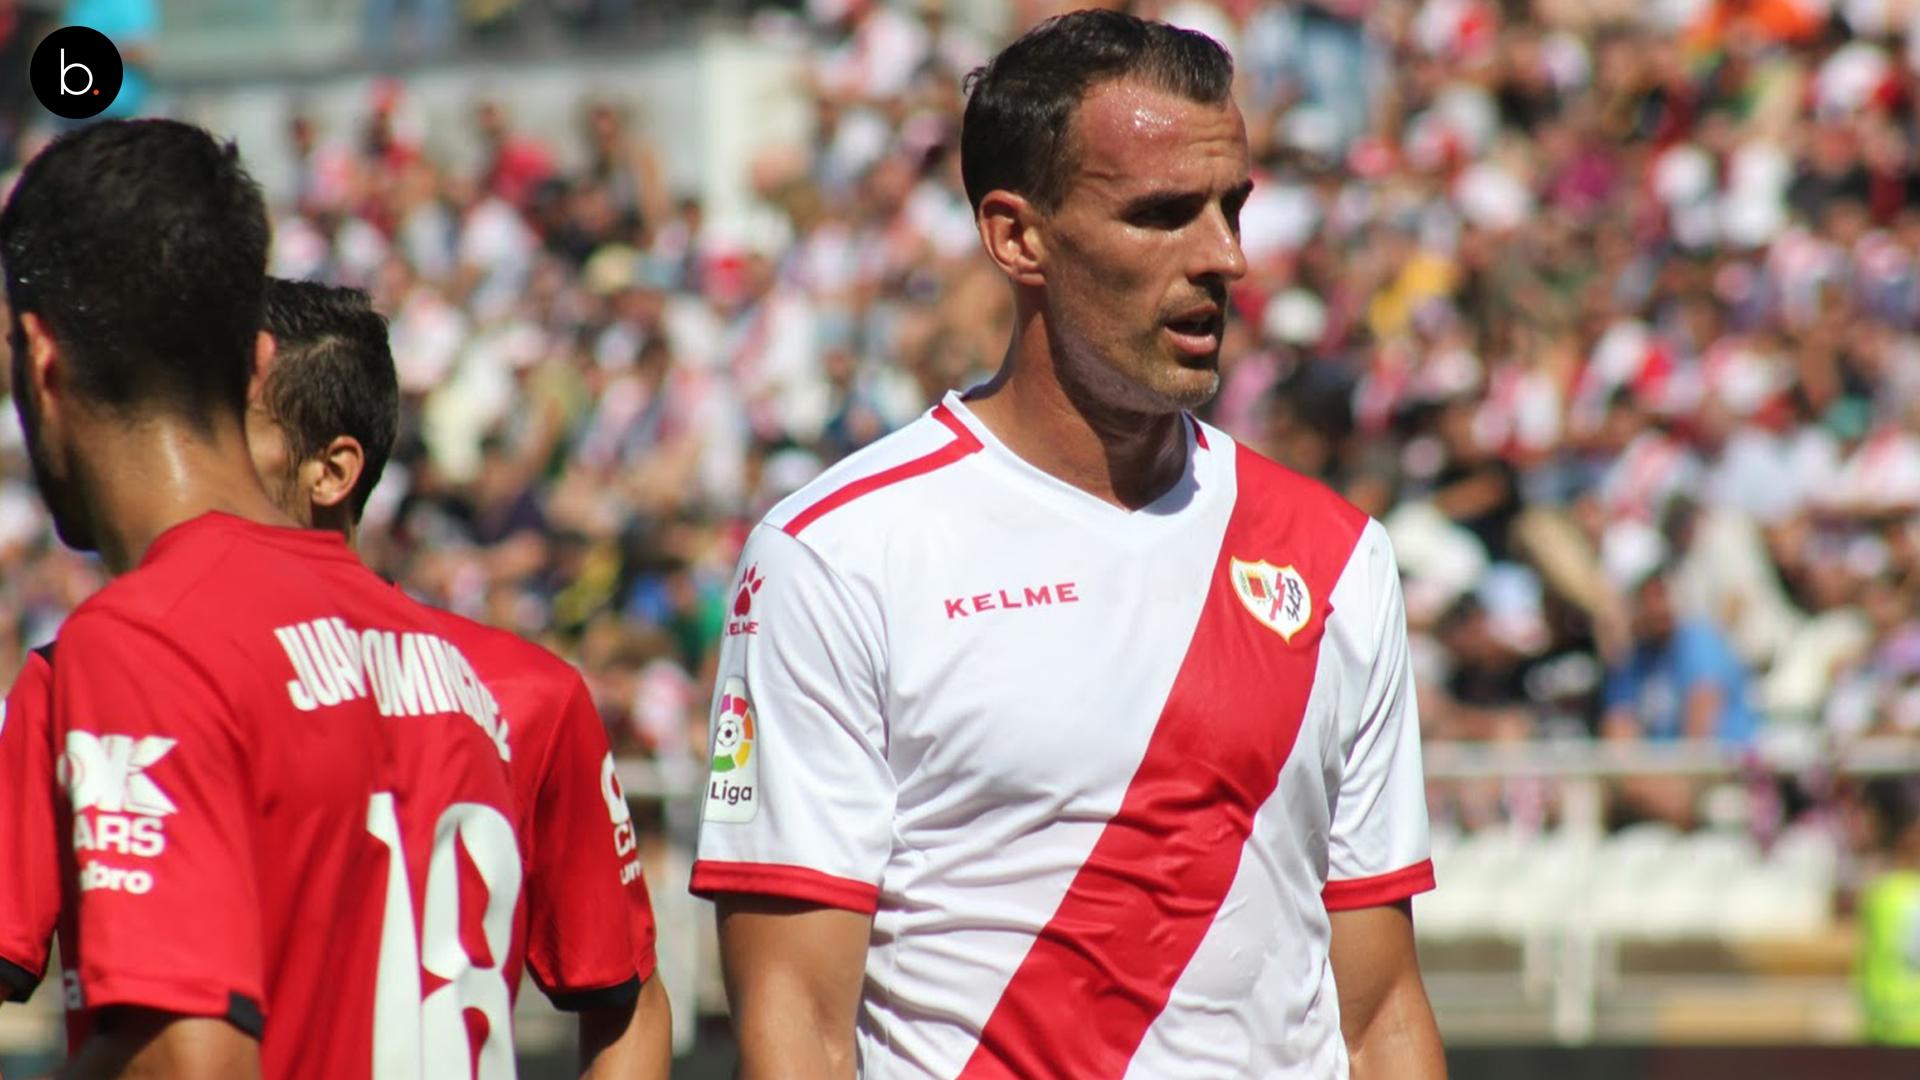 Amaya responsabiliza a Florentino Pérez y defiende a Lopetegui